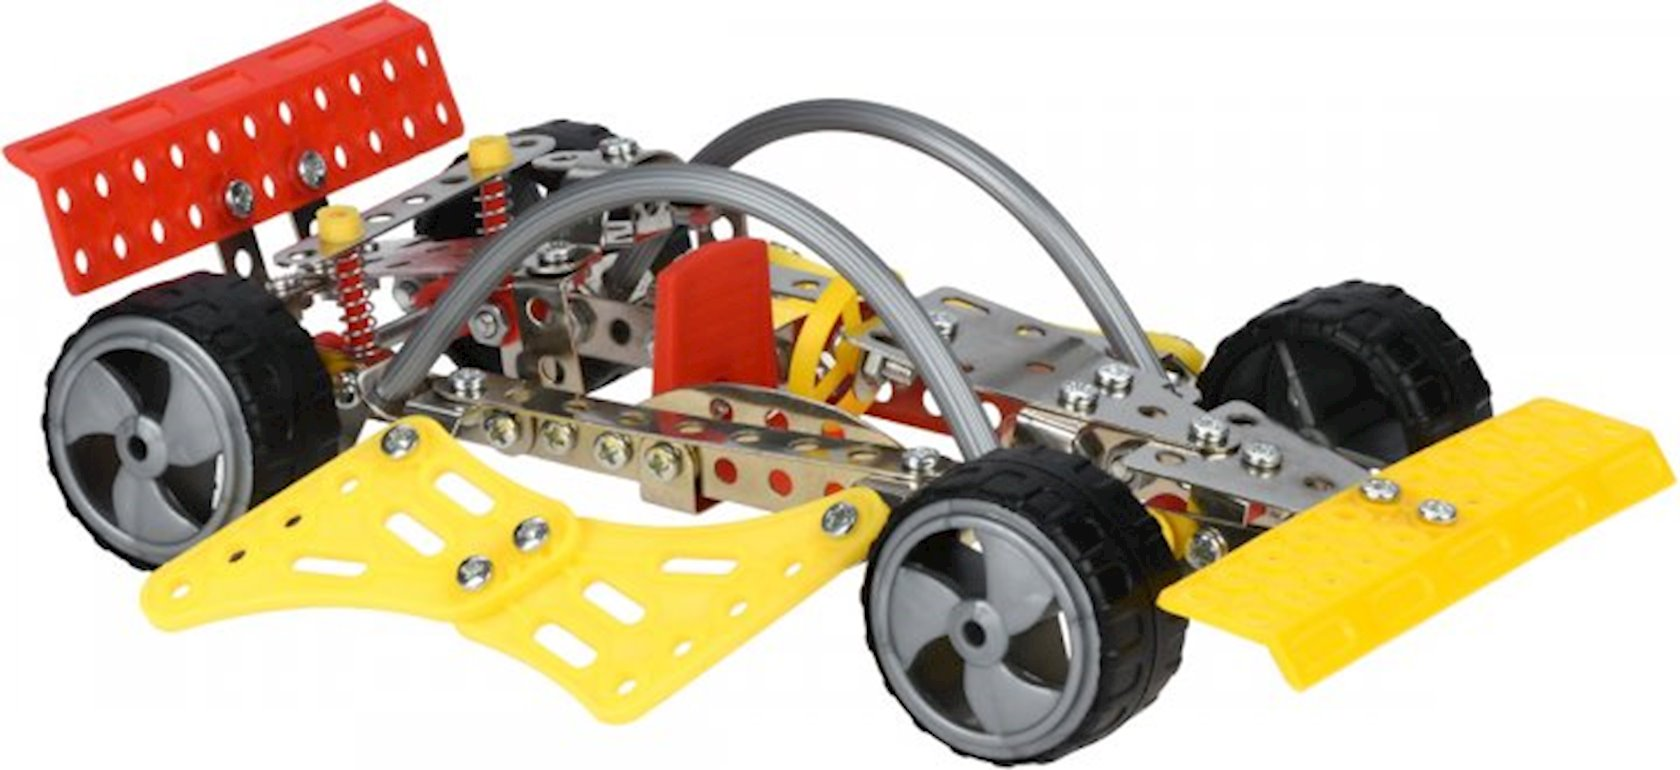 Metal konstruktor Same Toy Inteligent DIY Model, 195 element, 8+ yaş, metal/plastik